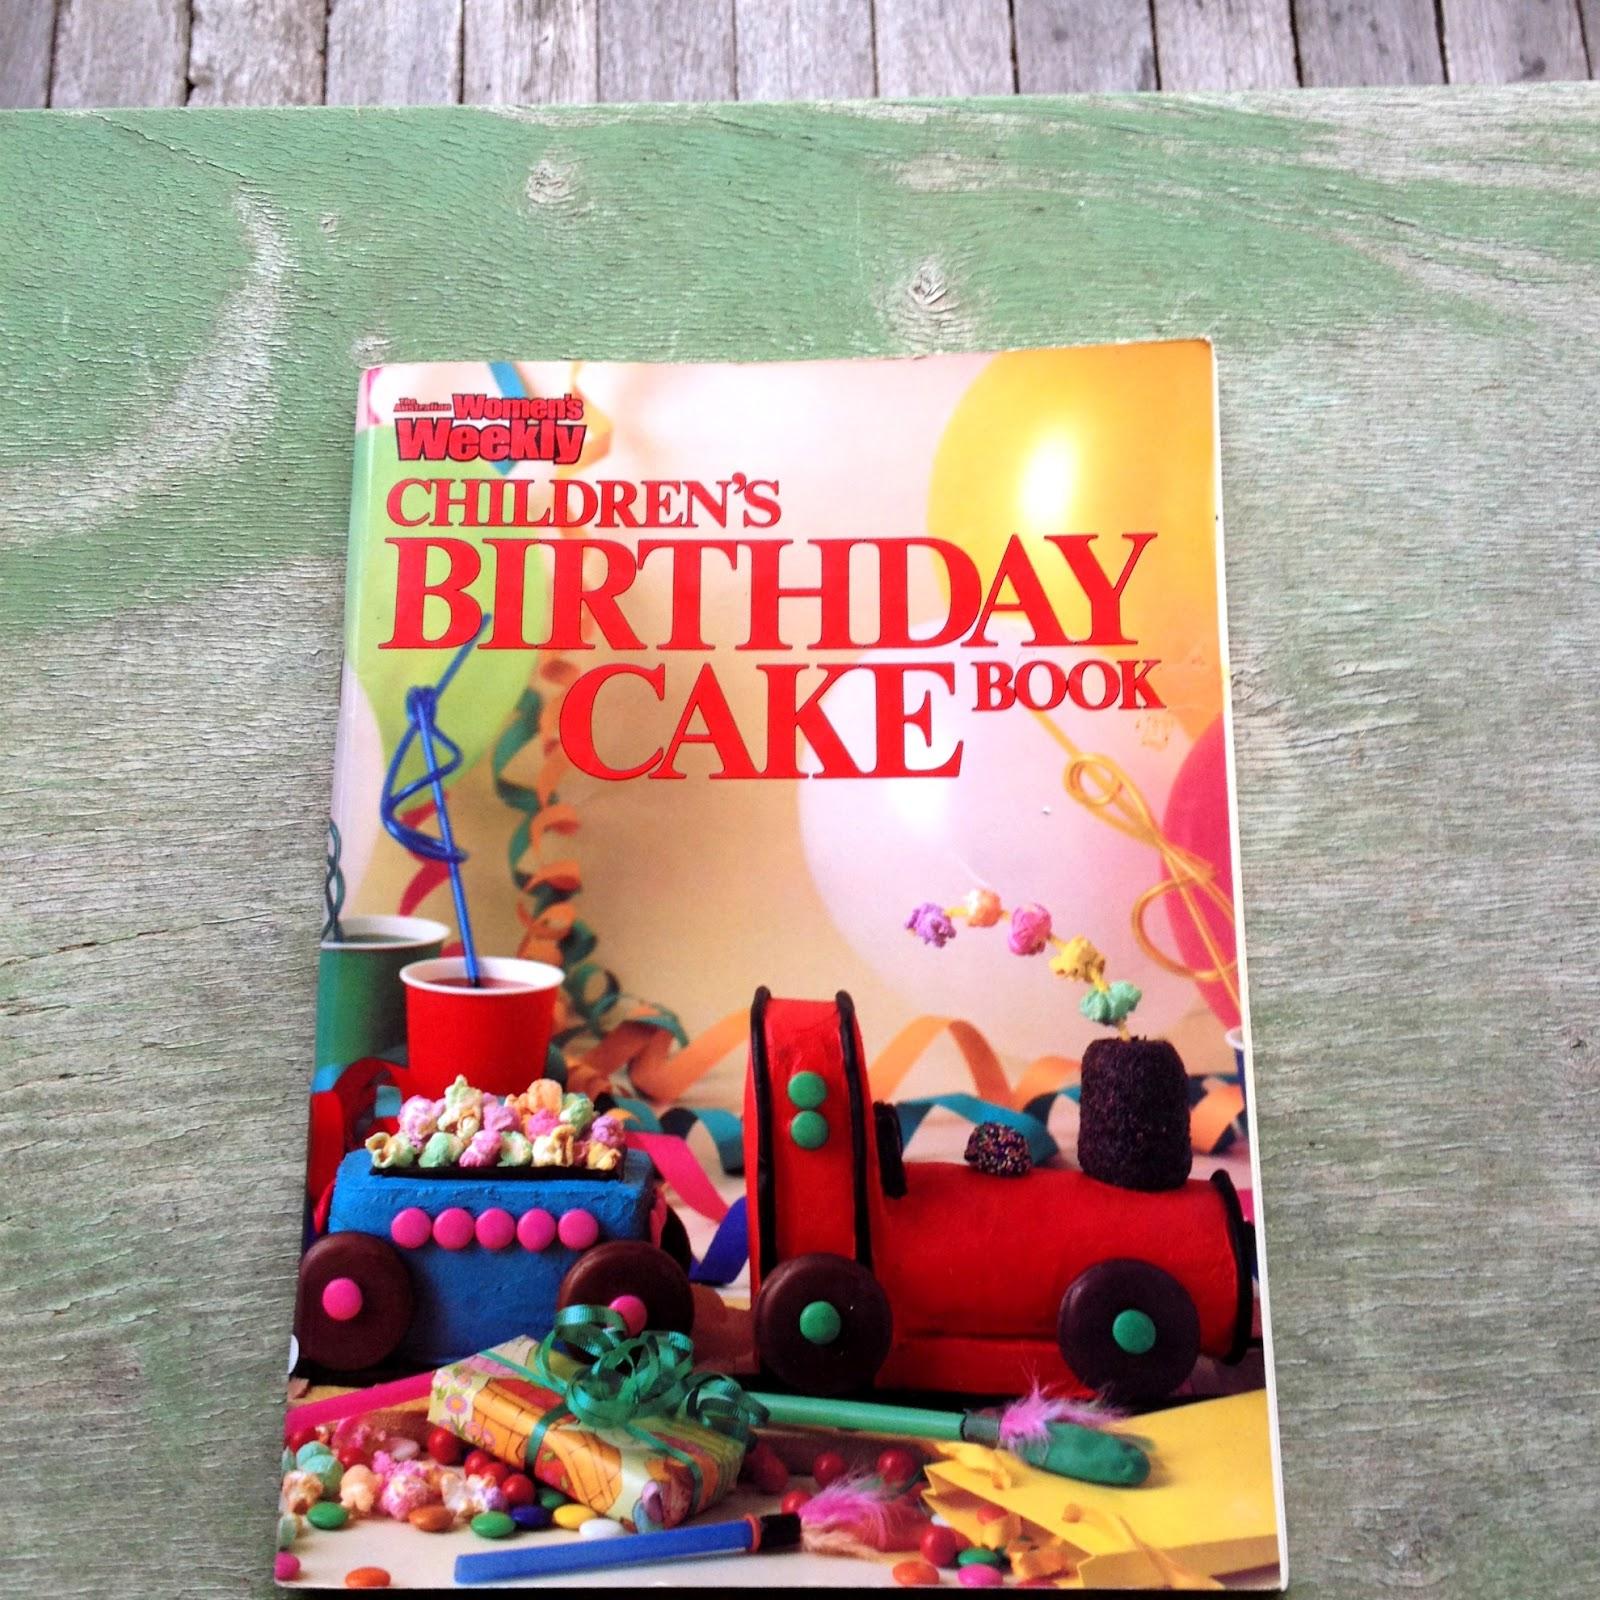 Cristarella Cakes Children S Cakes: Women's Weekly Children's Birthday Cake Book